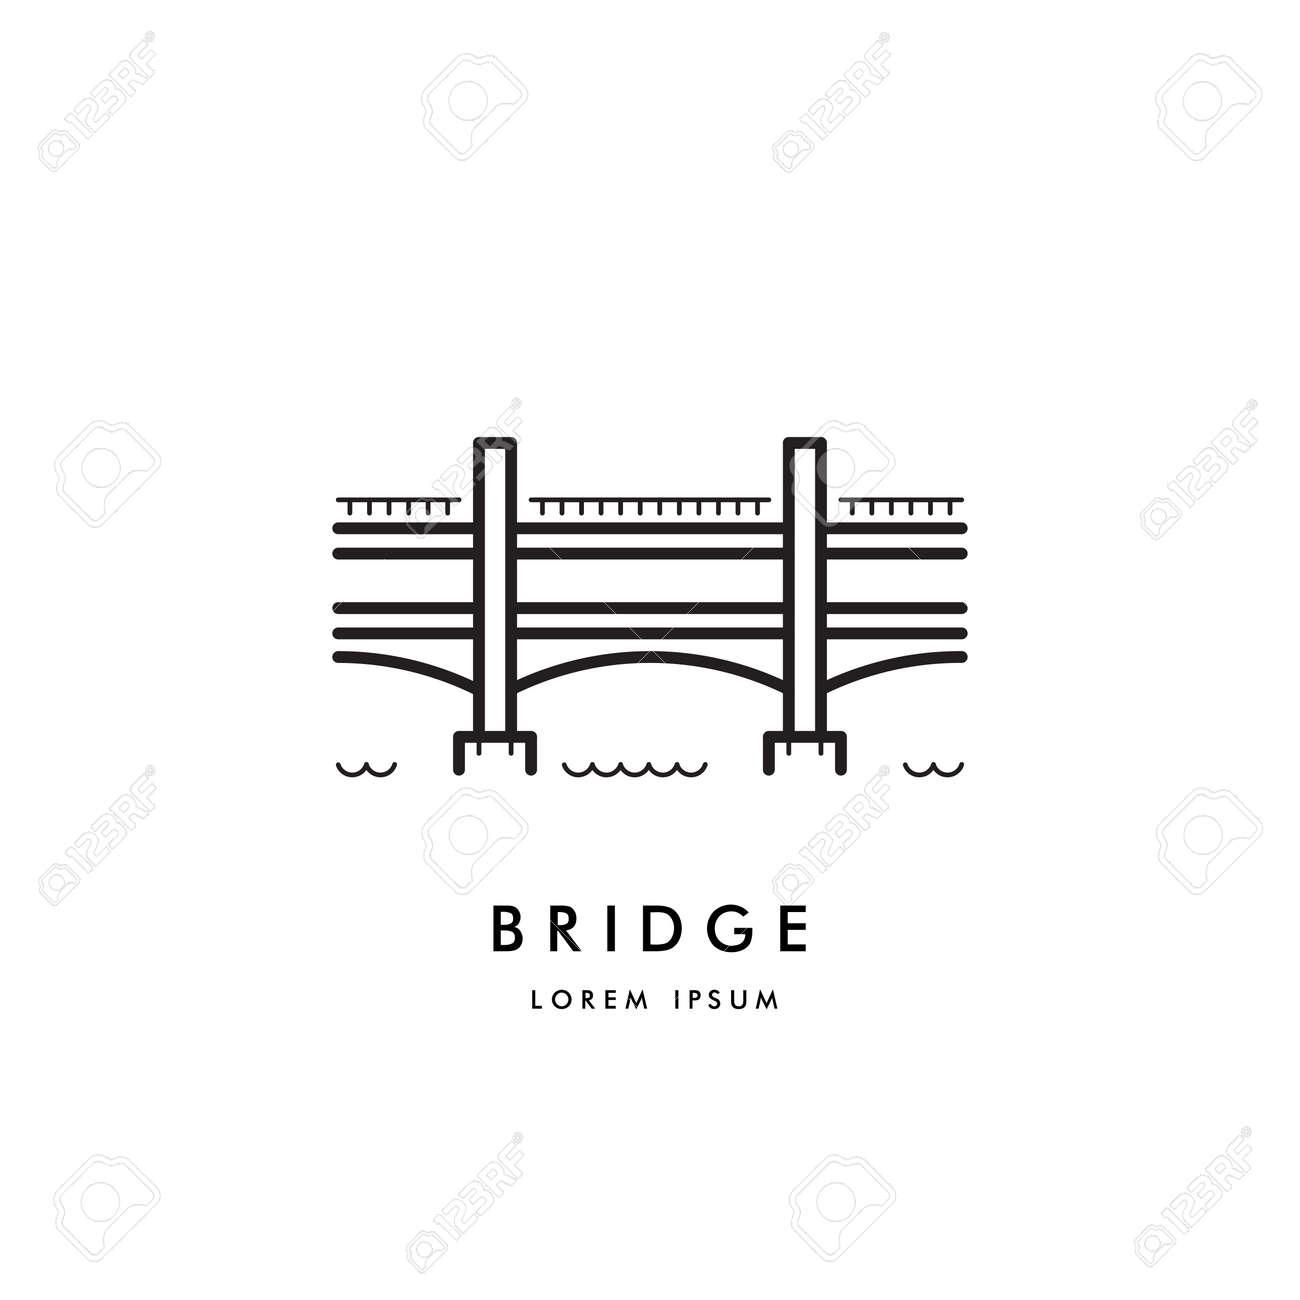 vector logo a simple two tier bridge the symbol of the artery